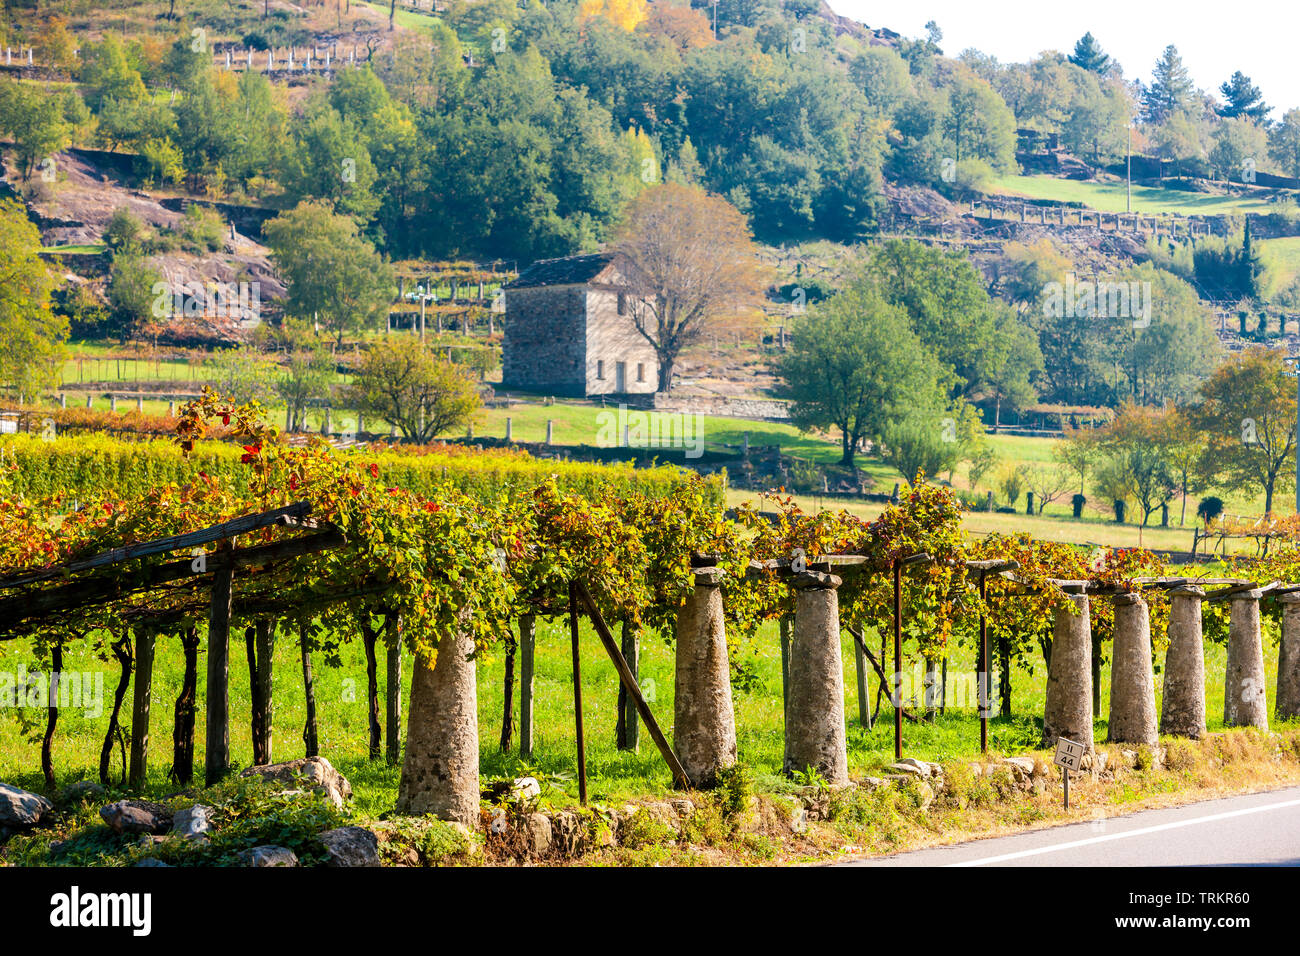 vineyard, Valle d'aosta, Italy - Stock Image